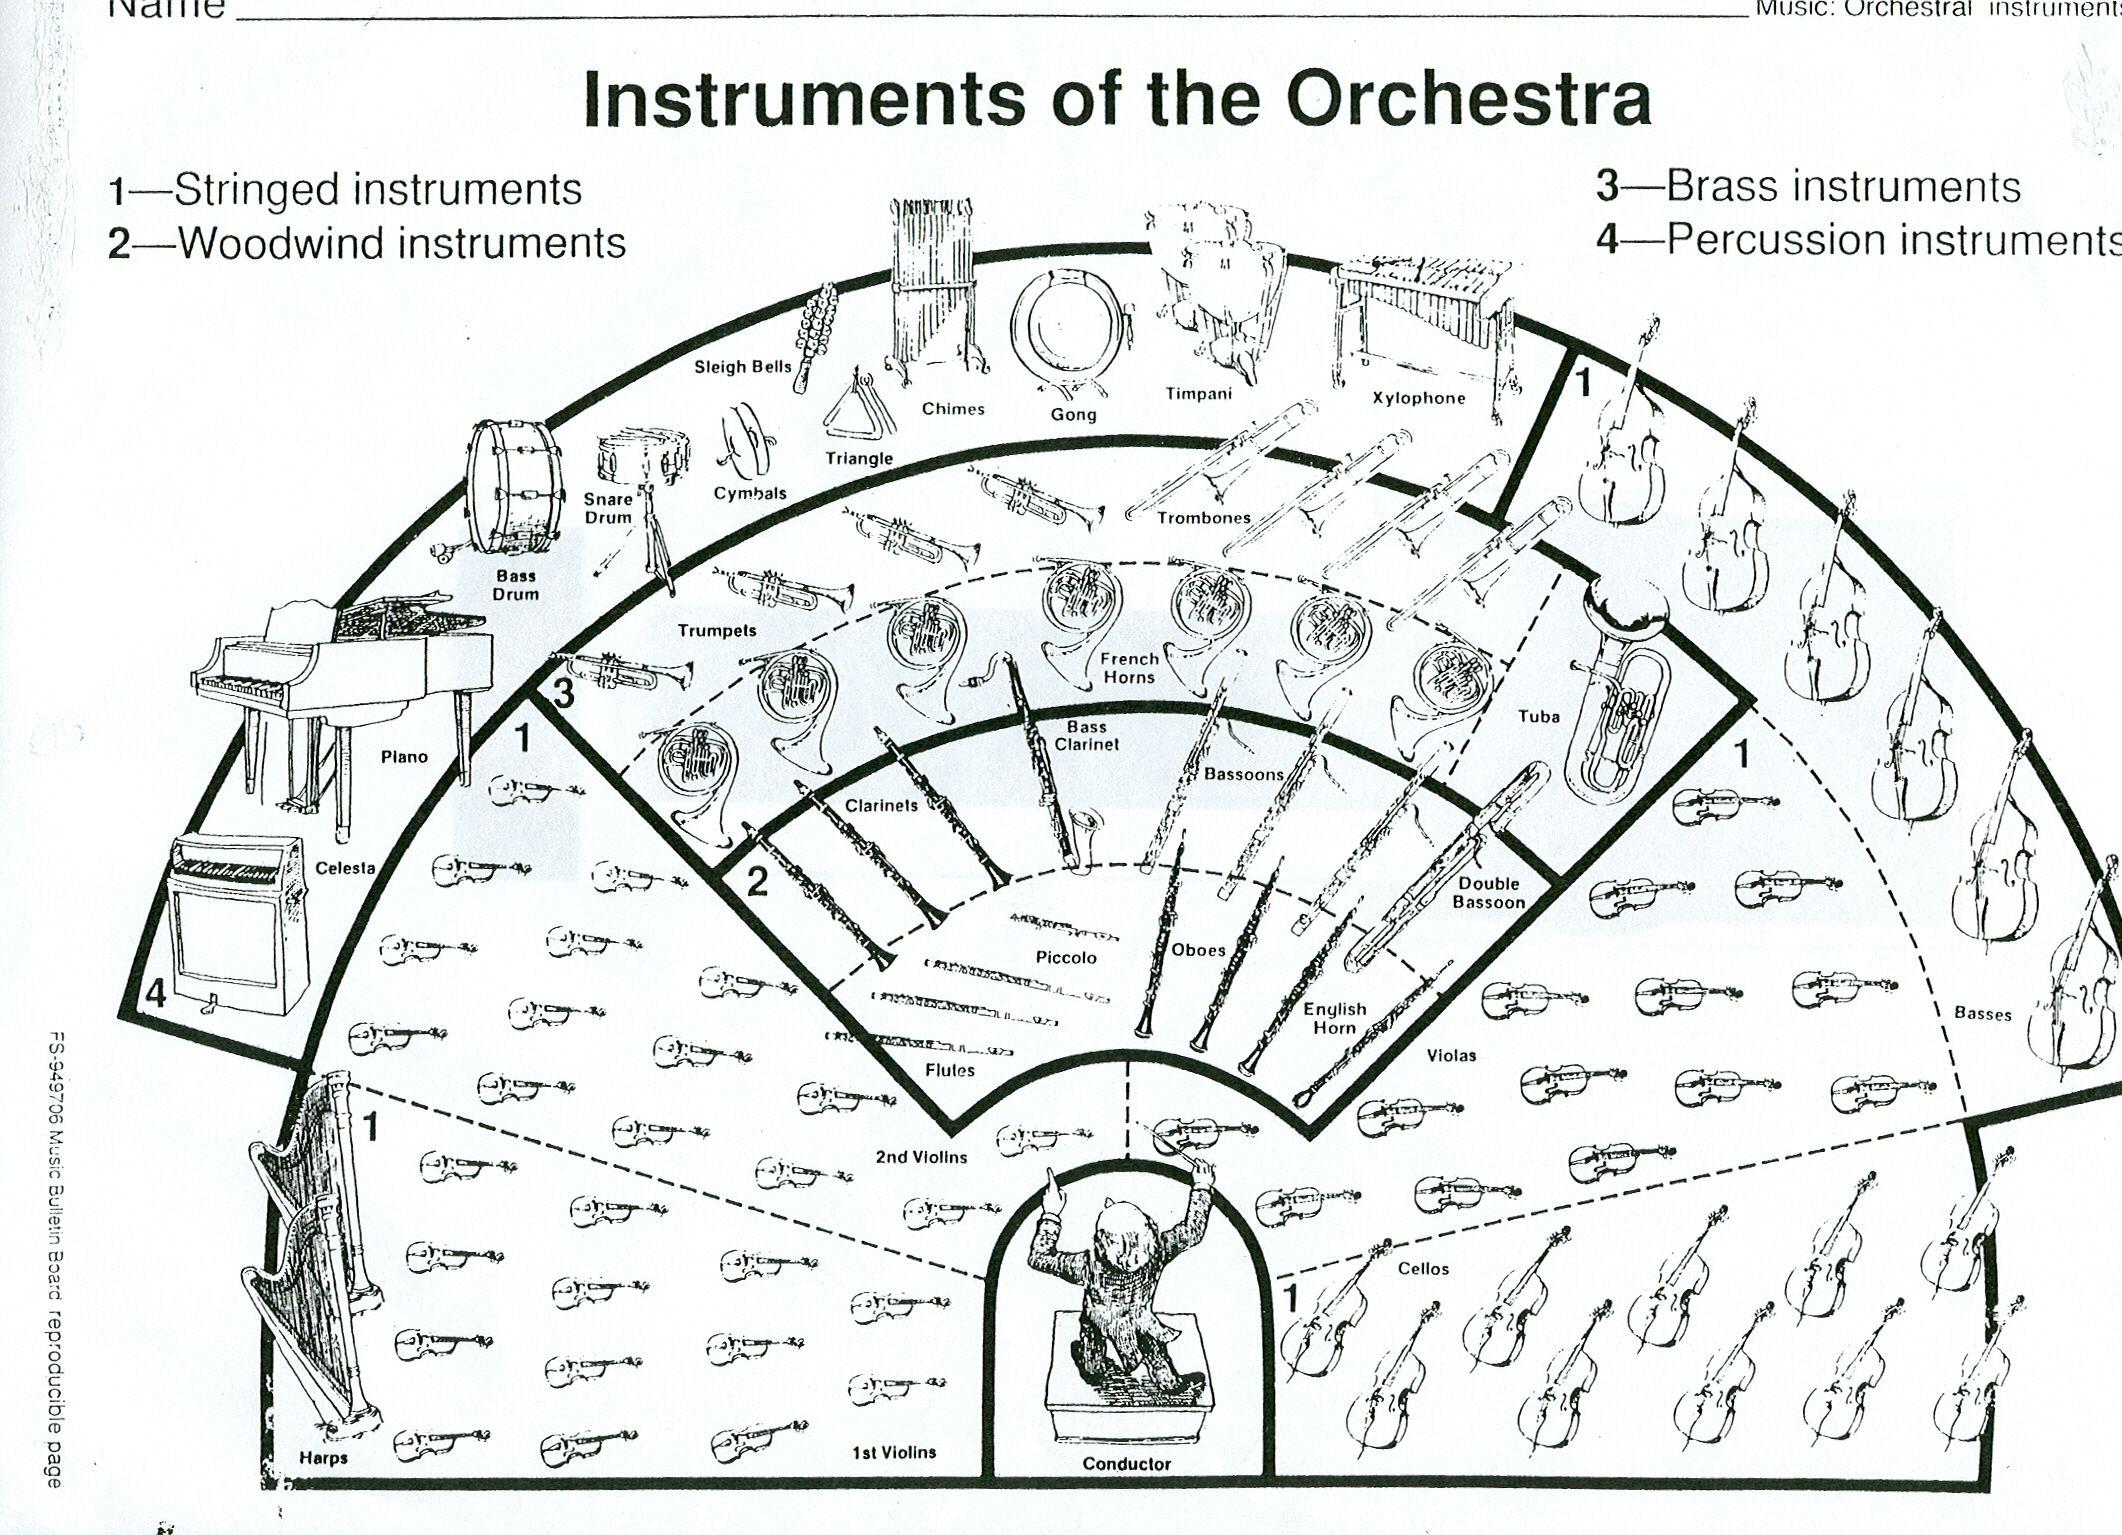 Pin Di Amanda Hinson Su Learning About The Symphony